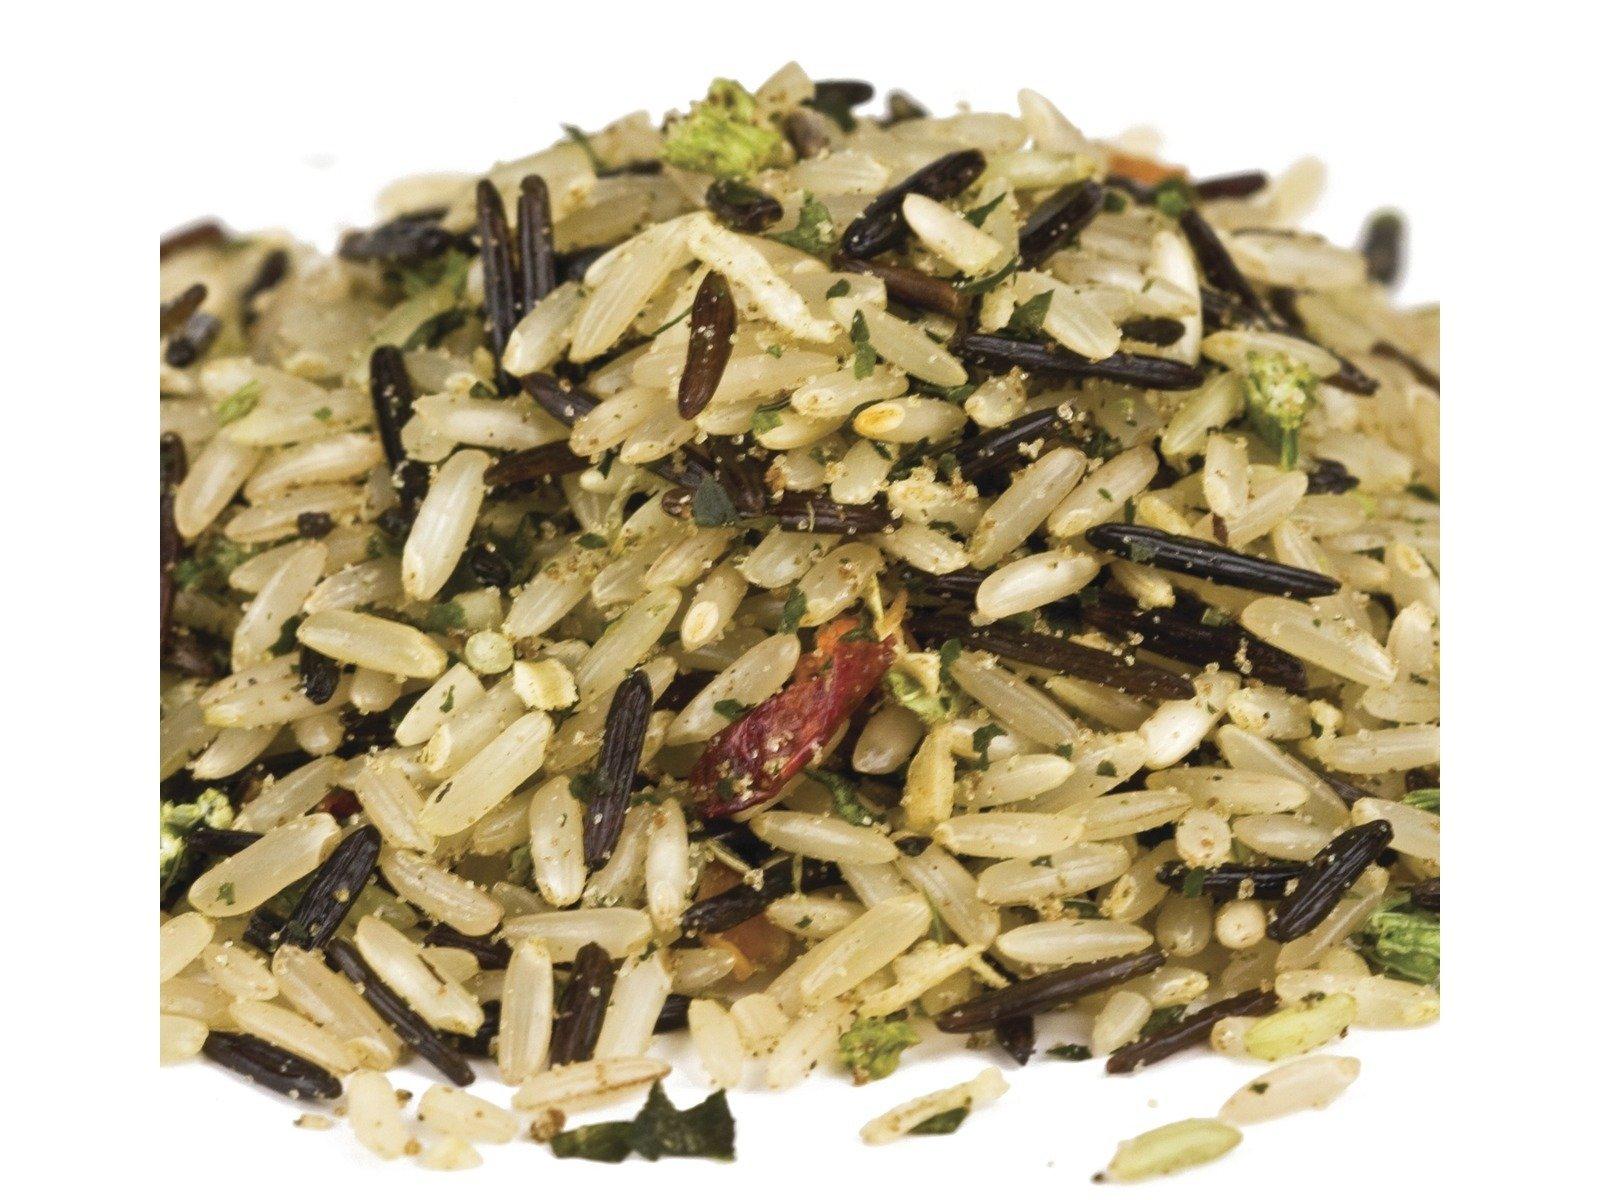 Brown & Wild Rice Pilaf 5 lbs. [Pack of 3] by Bulk Foods Inc.